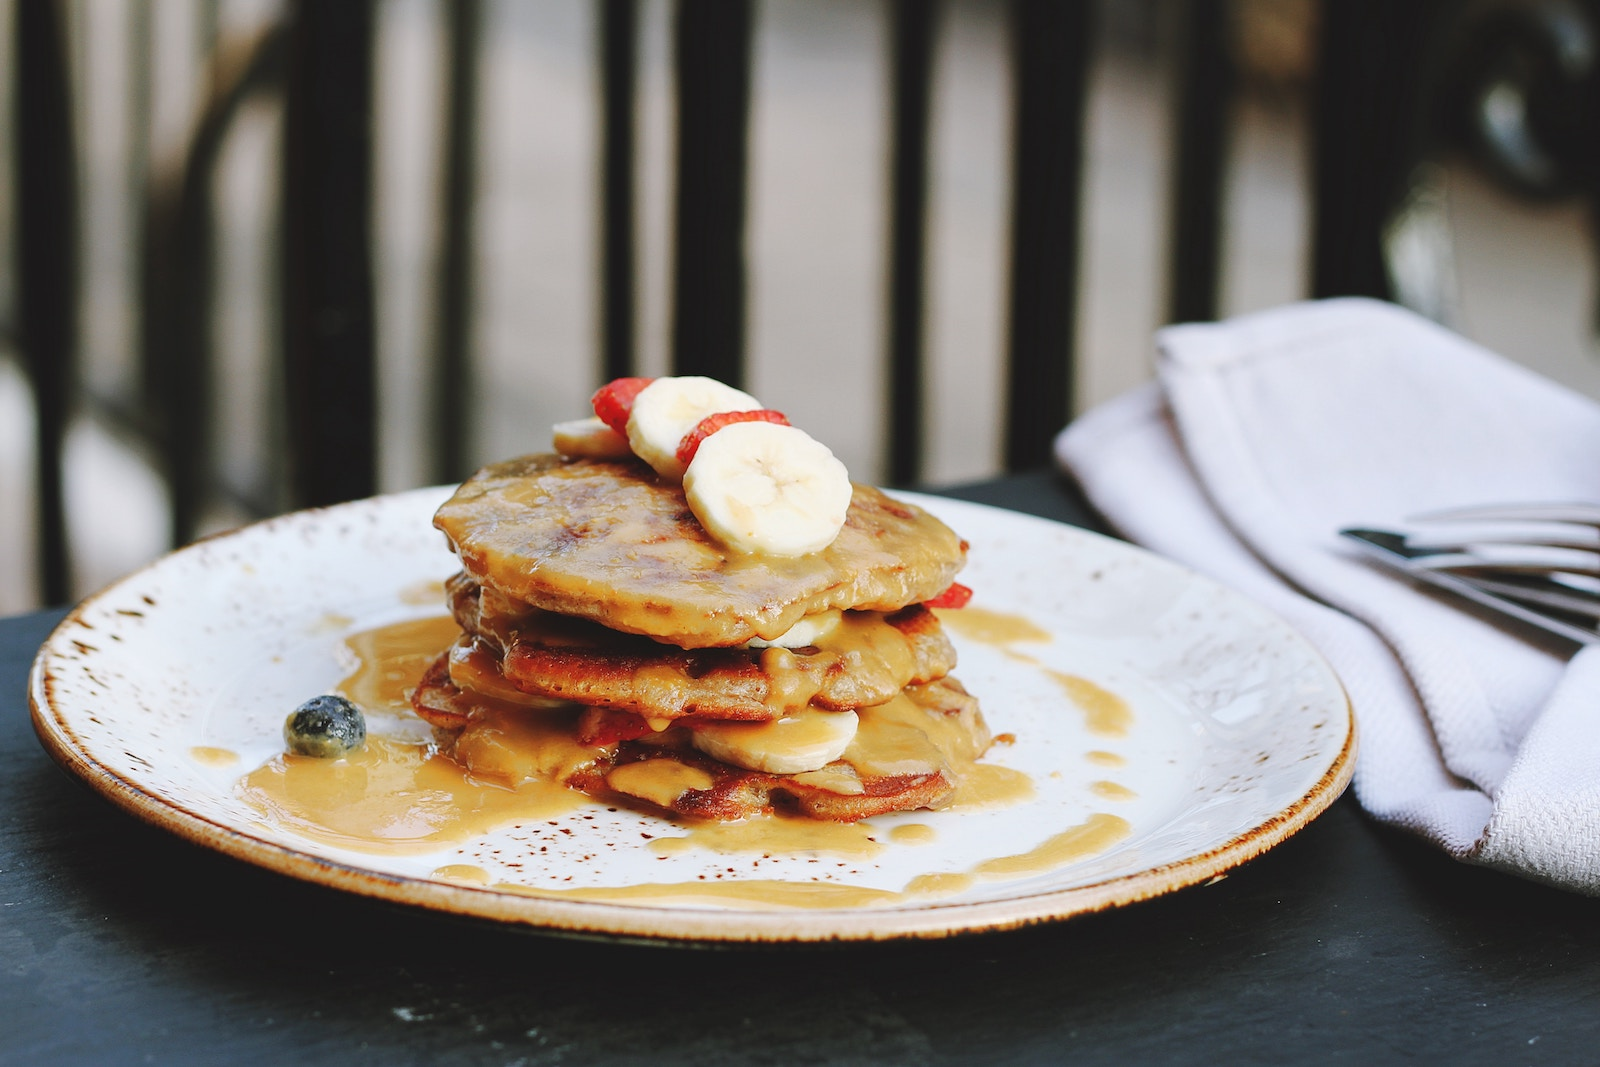 Erdbeer Bananen Protein Pancakes Rezept - Photo by Toa Heftiba on Unsplash